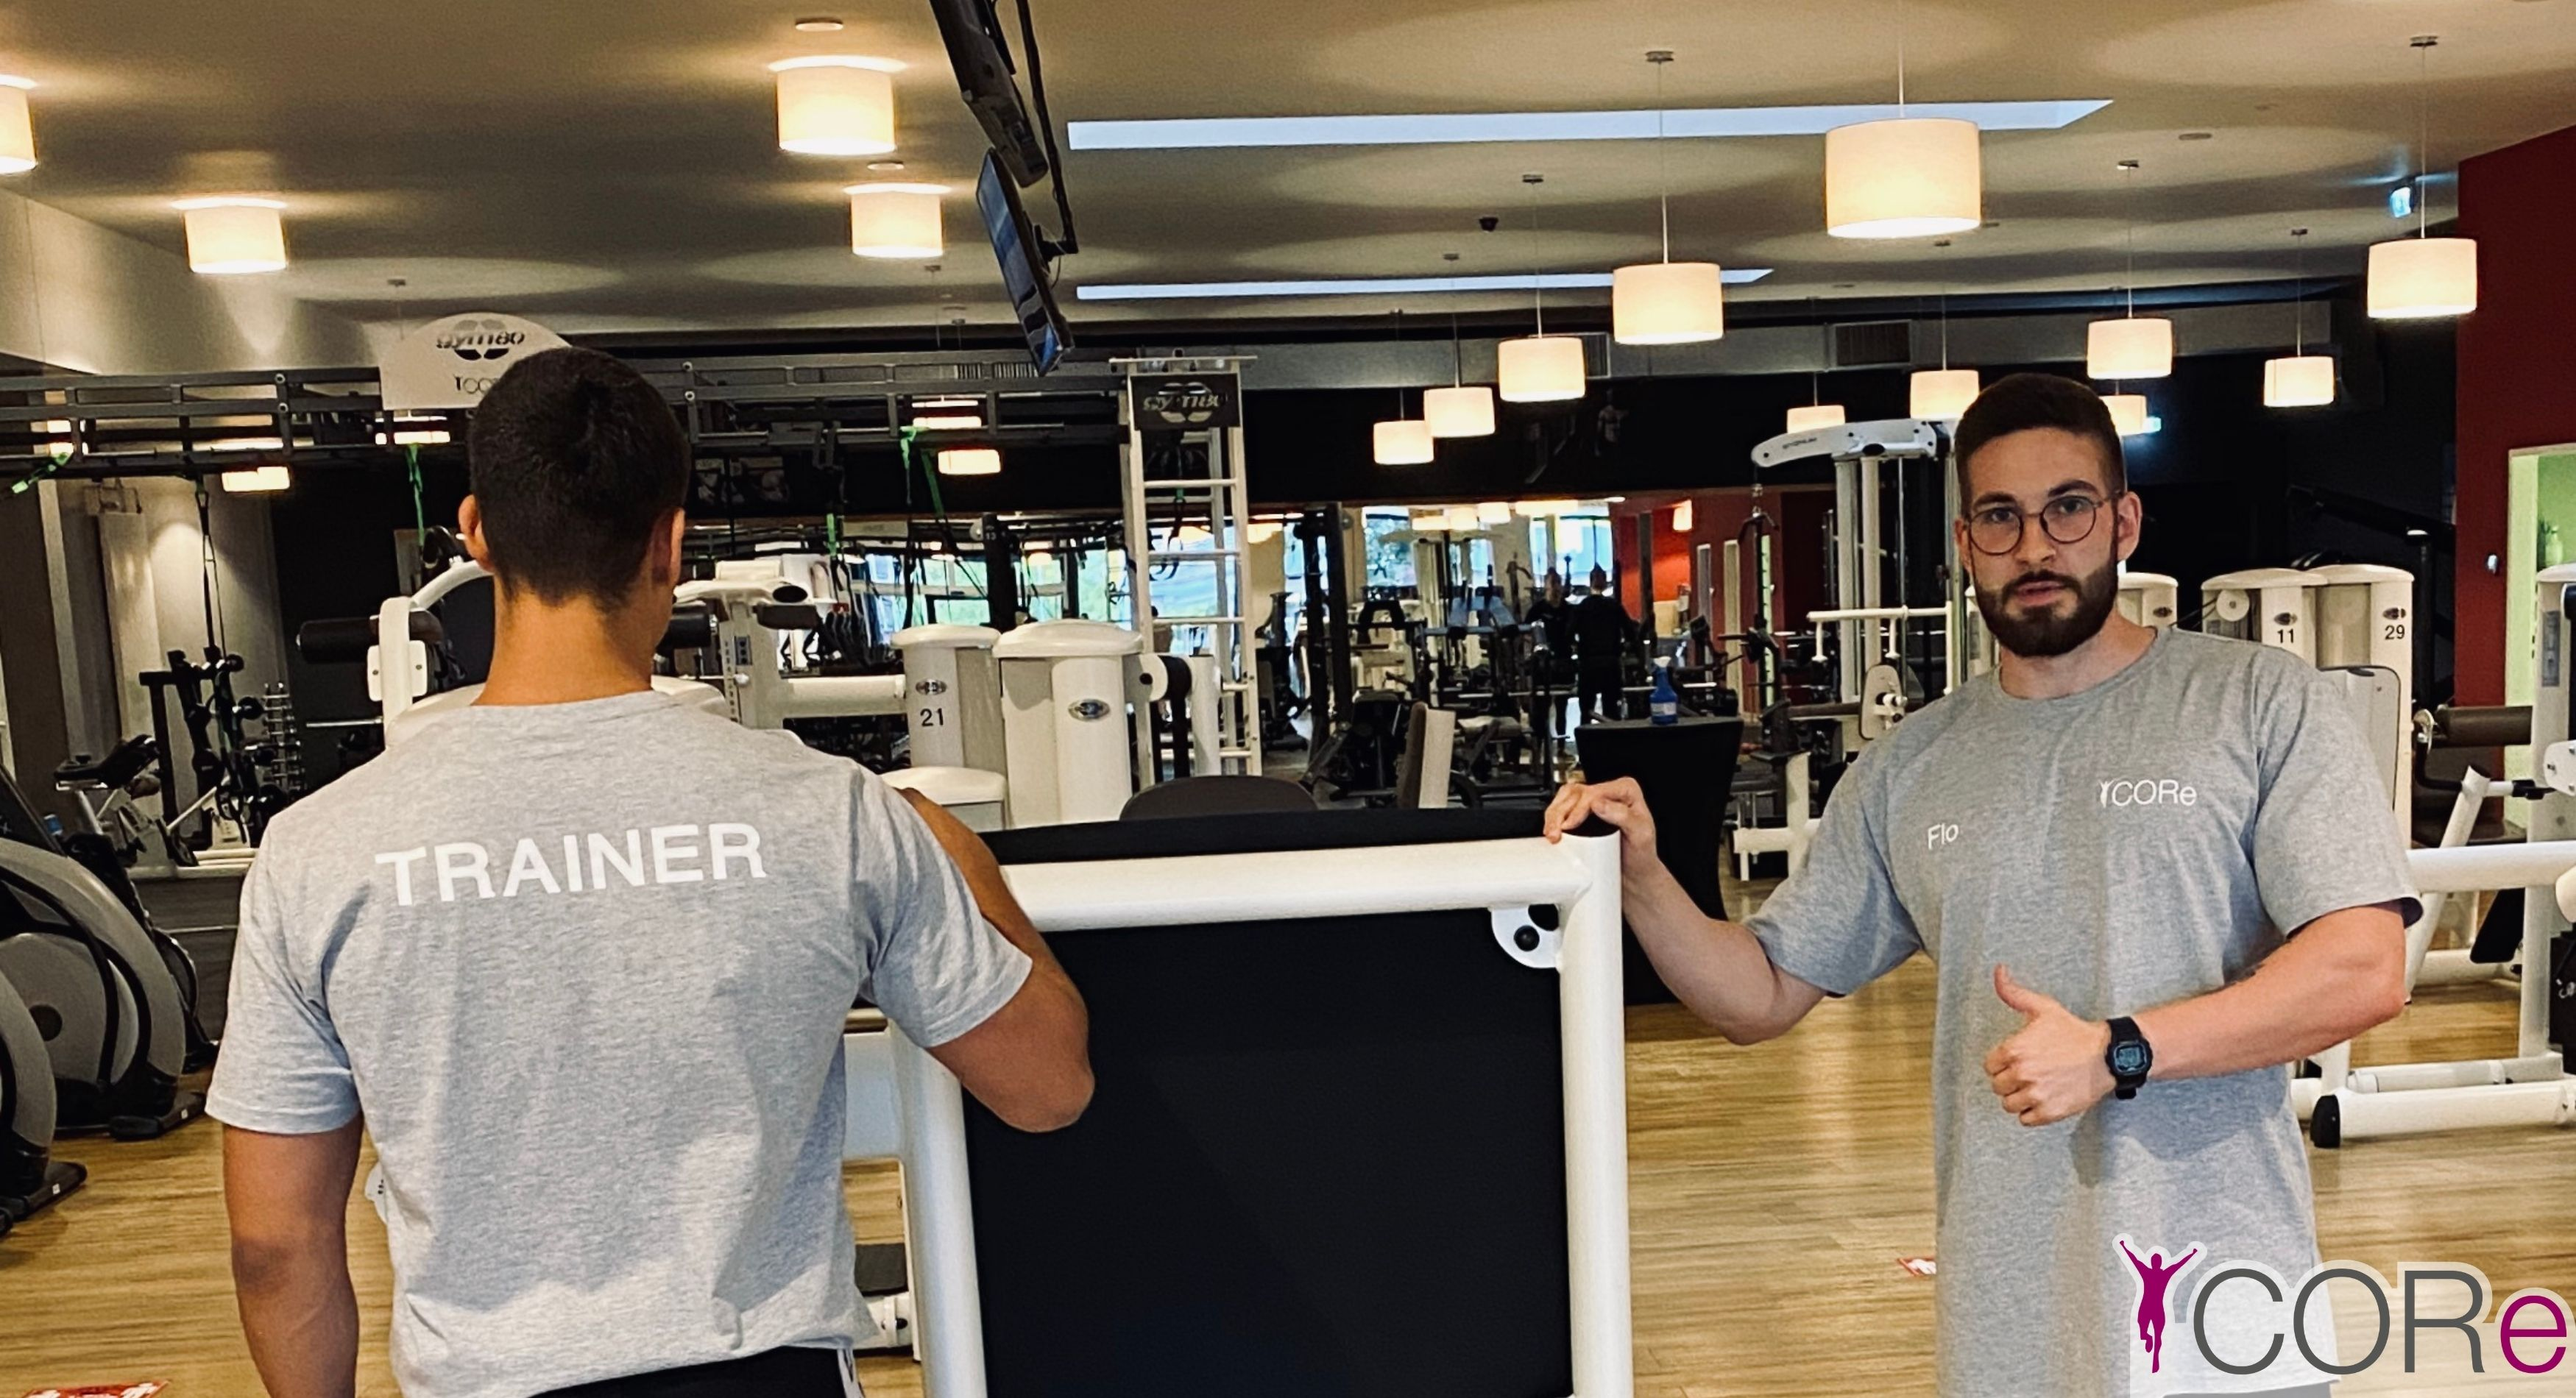 Neue Trainer - Shirts